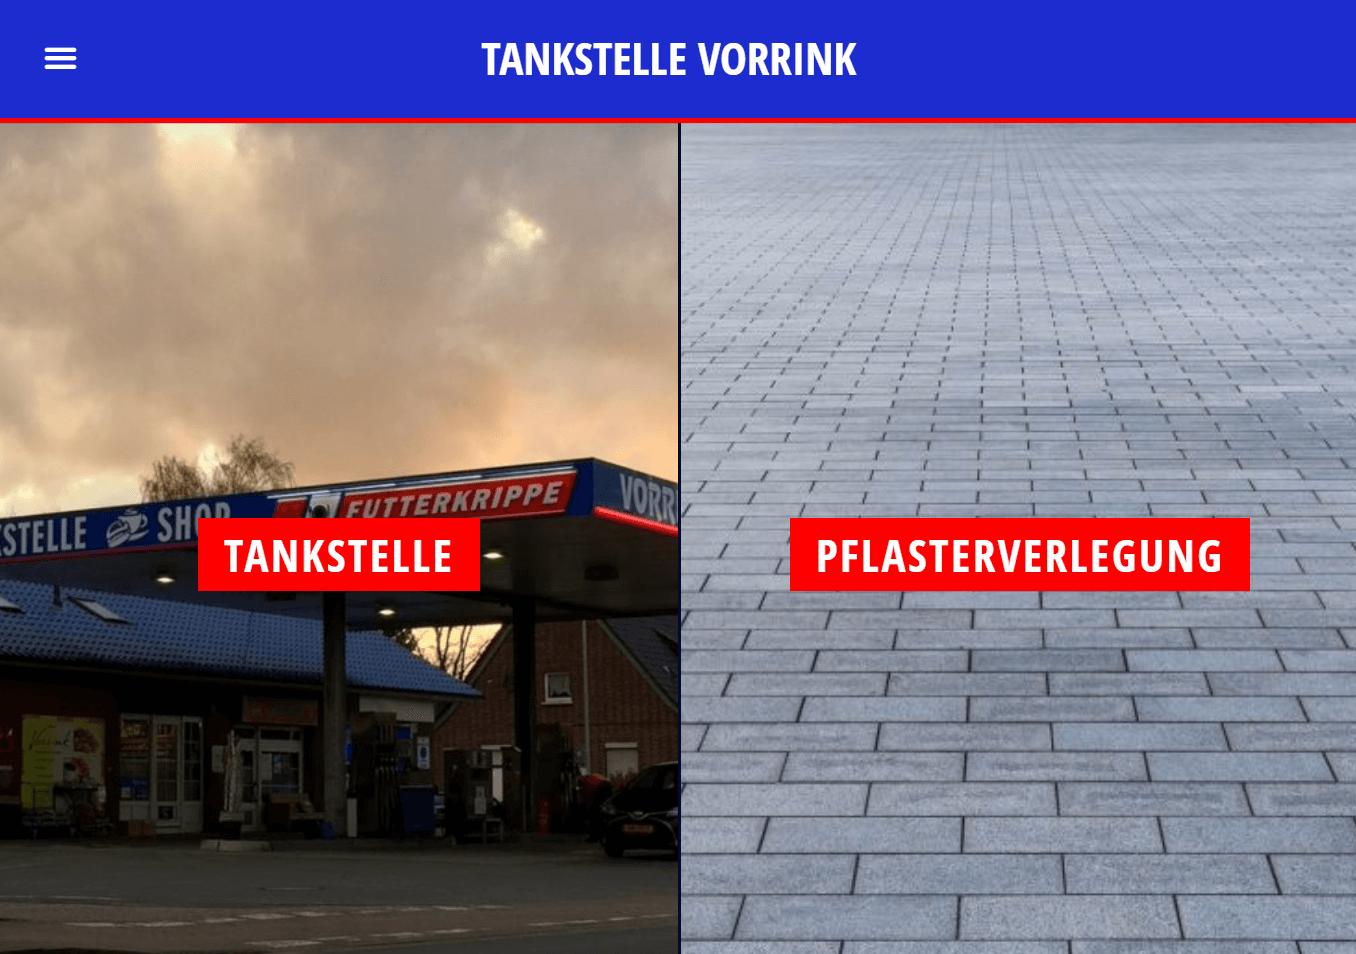 Tankstelle_Vorrink